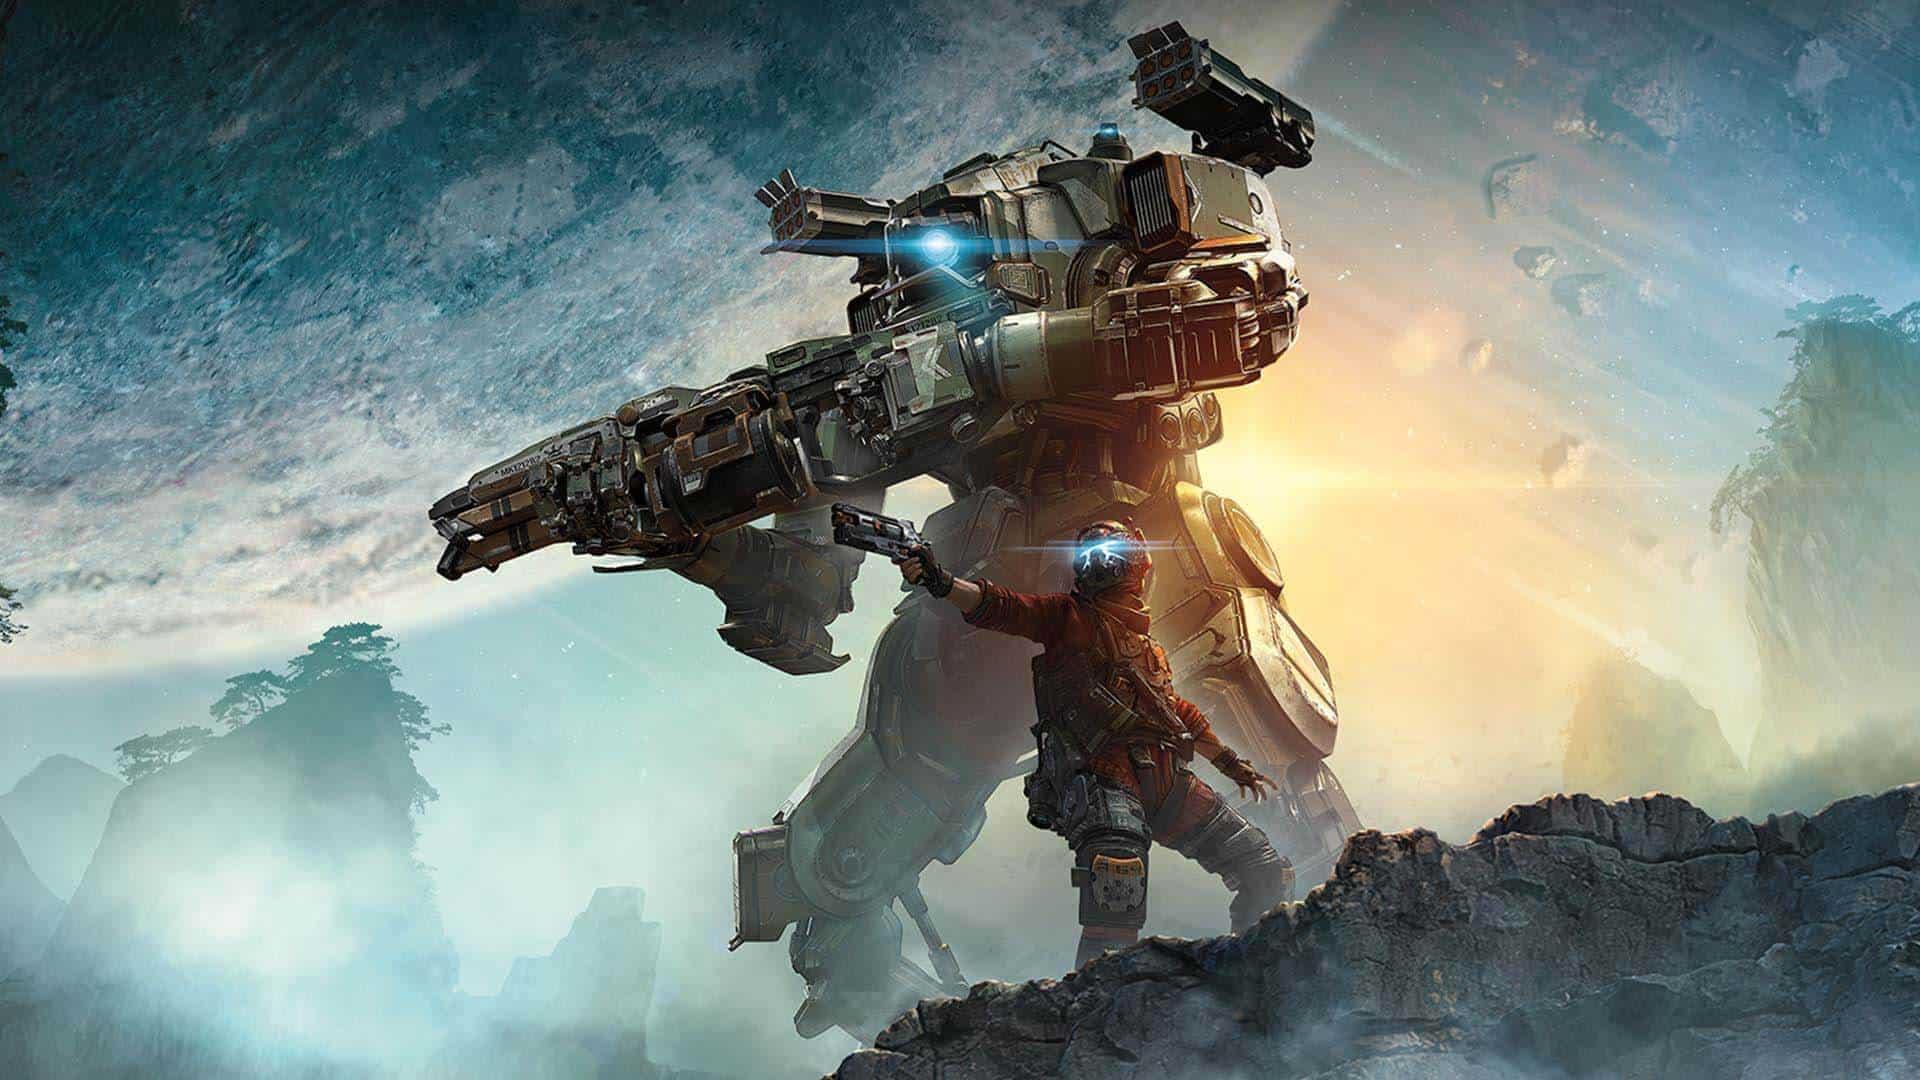 بازی ویدیویی تایتان فال (سقوط تایتان) - Titanfall Video Game